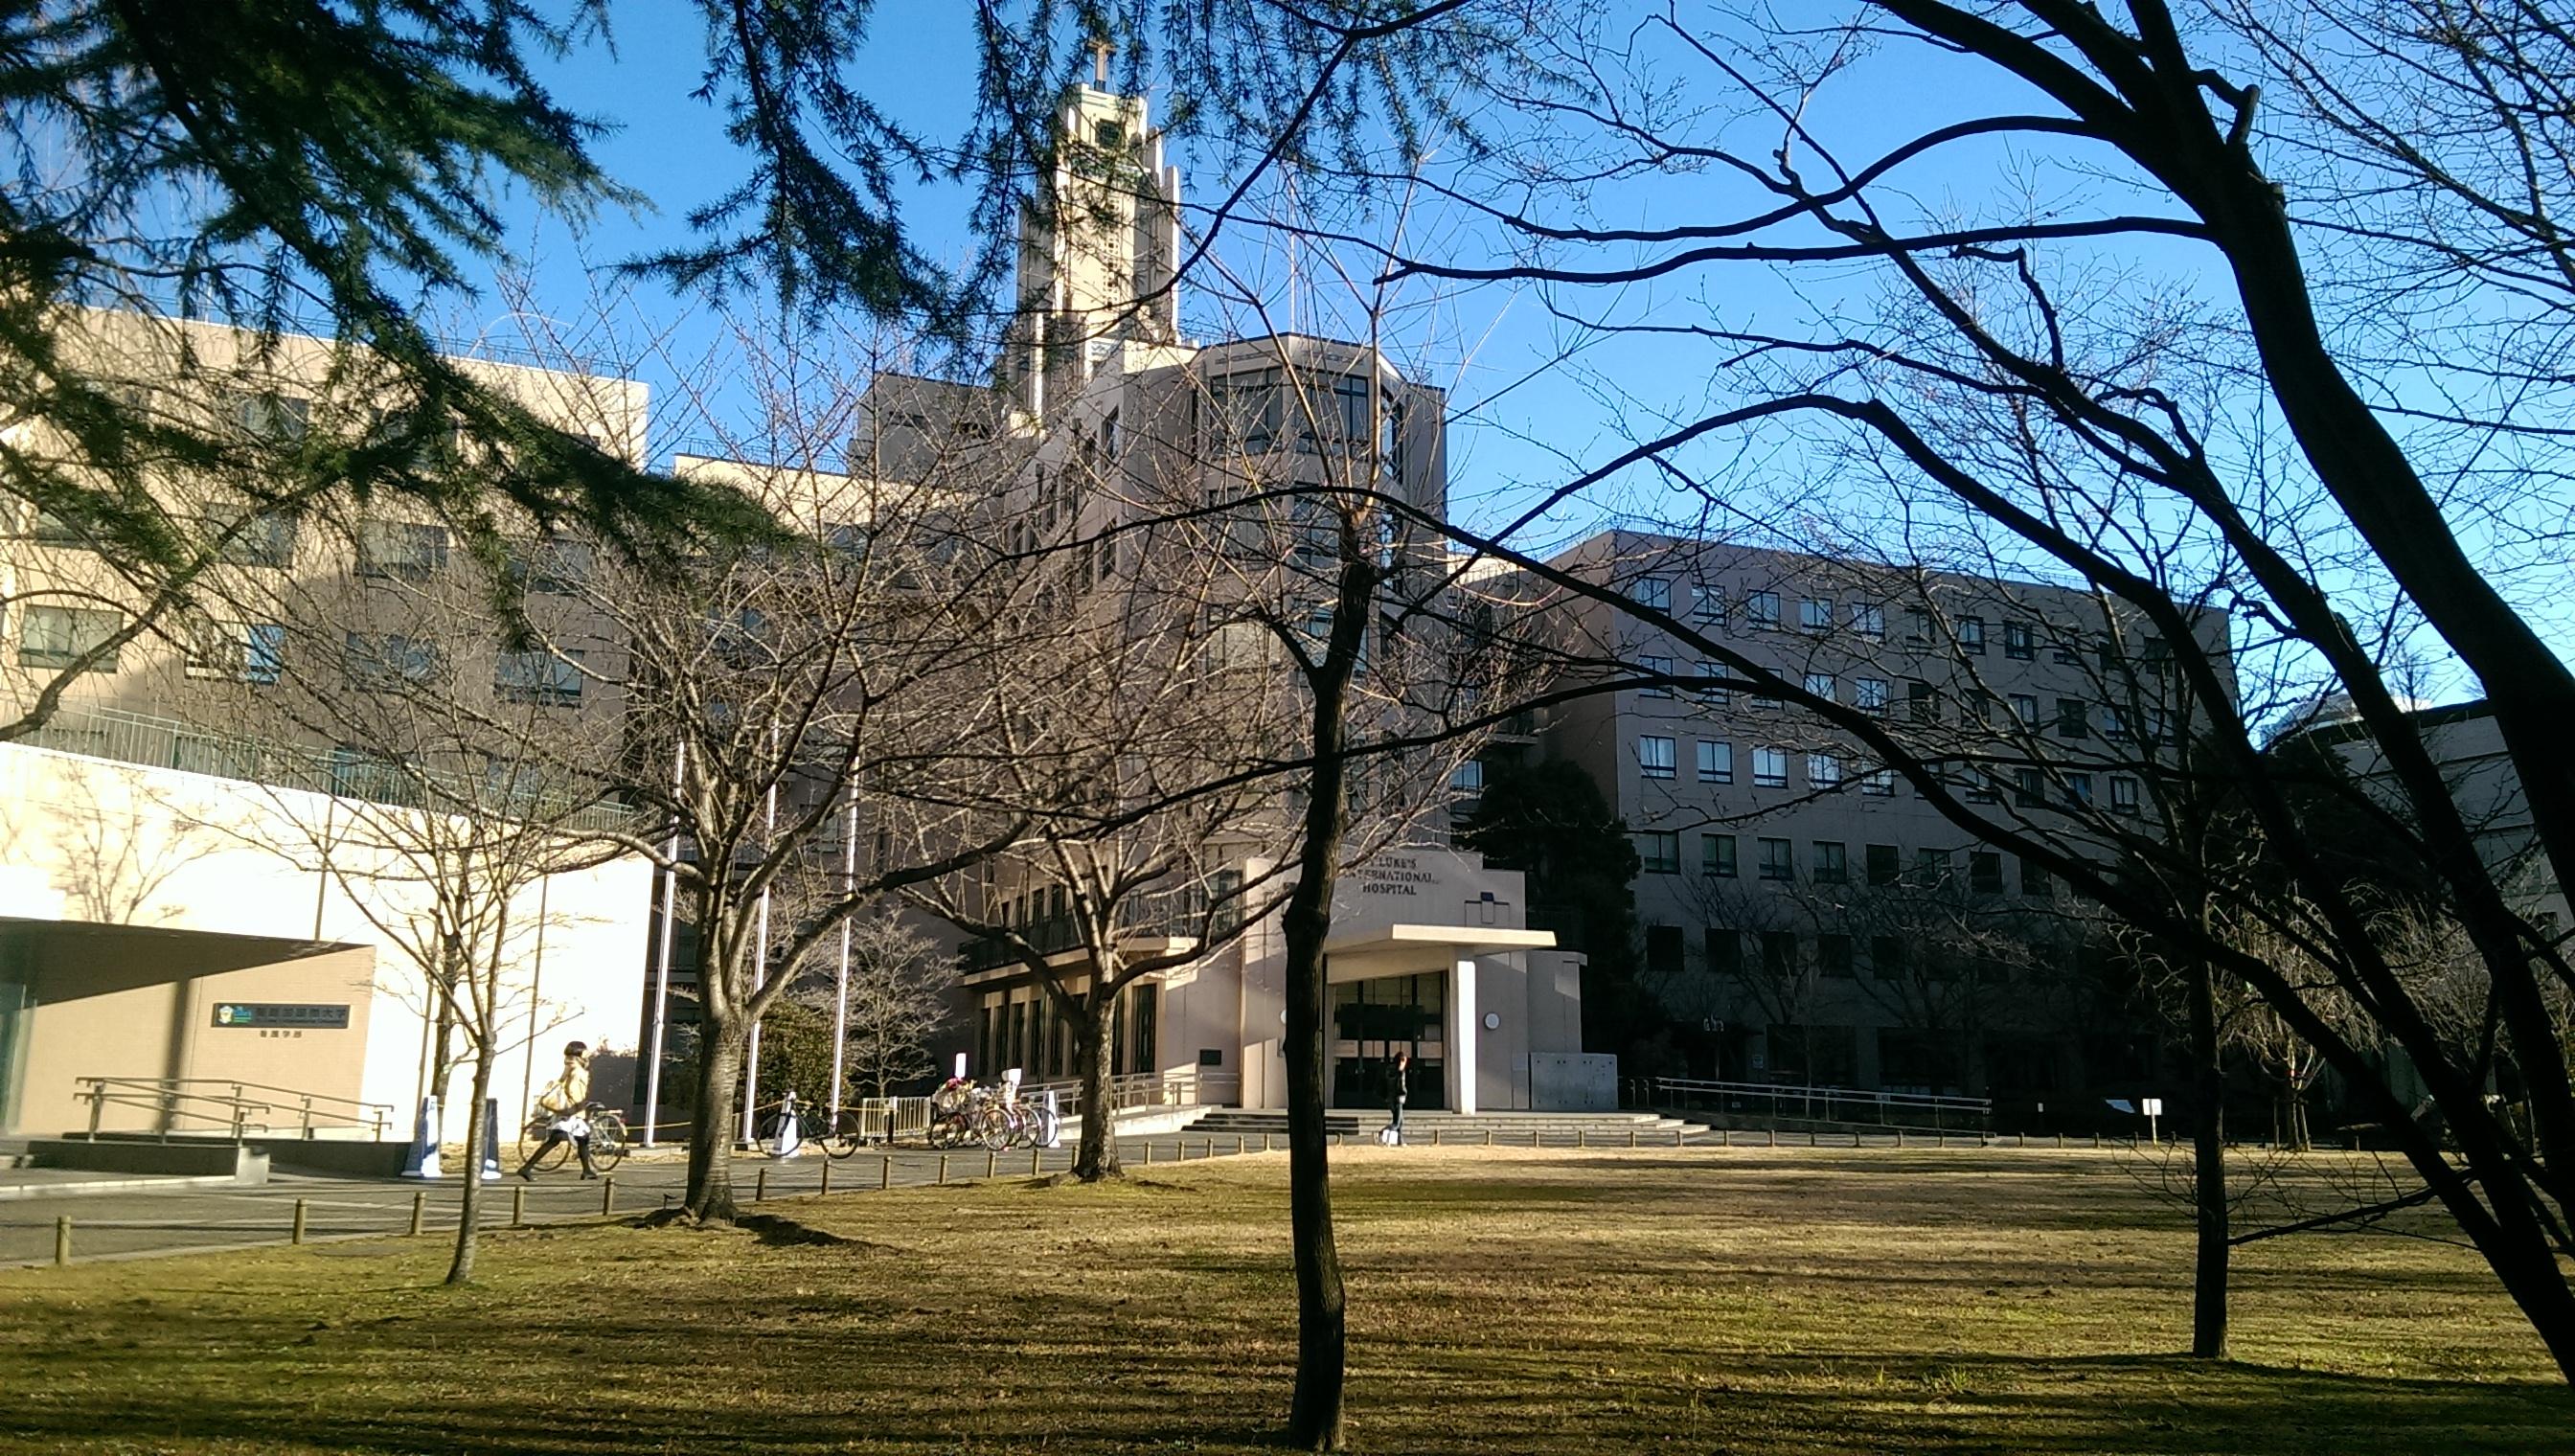 Getting sick ill in Tokyo St Luke's University Hospital